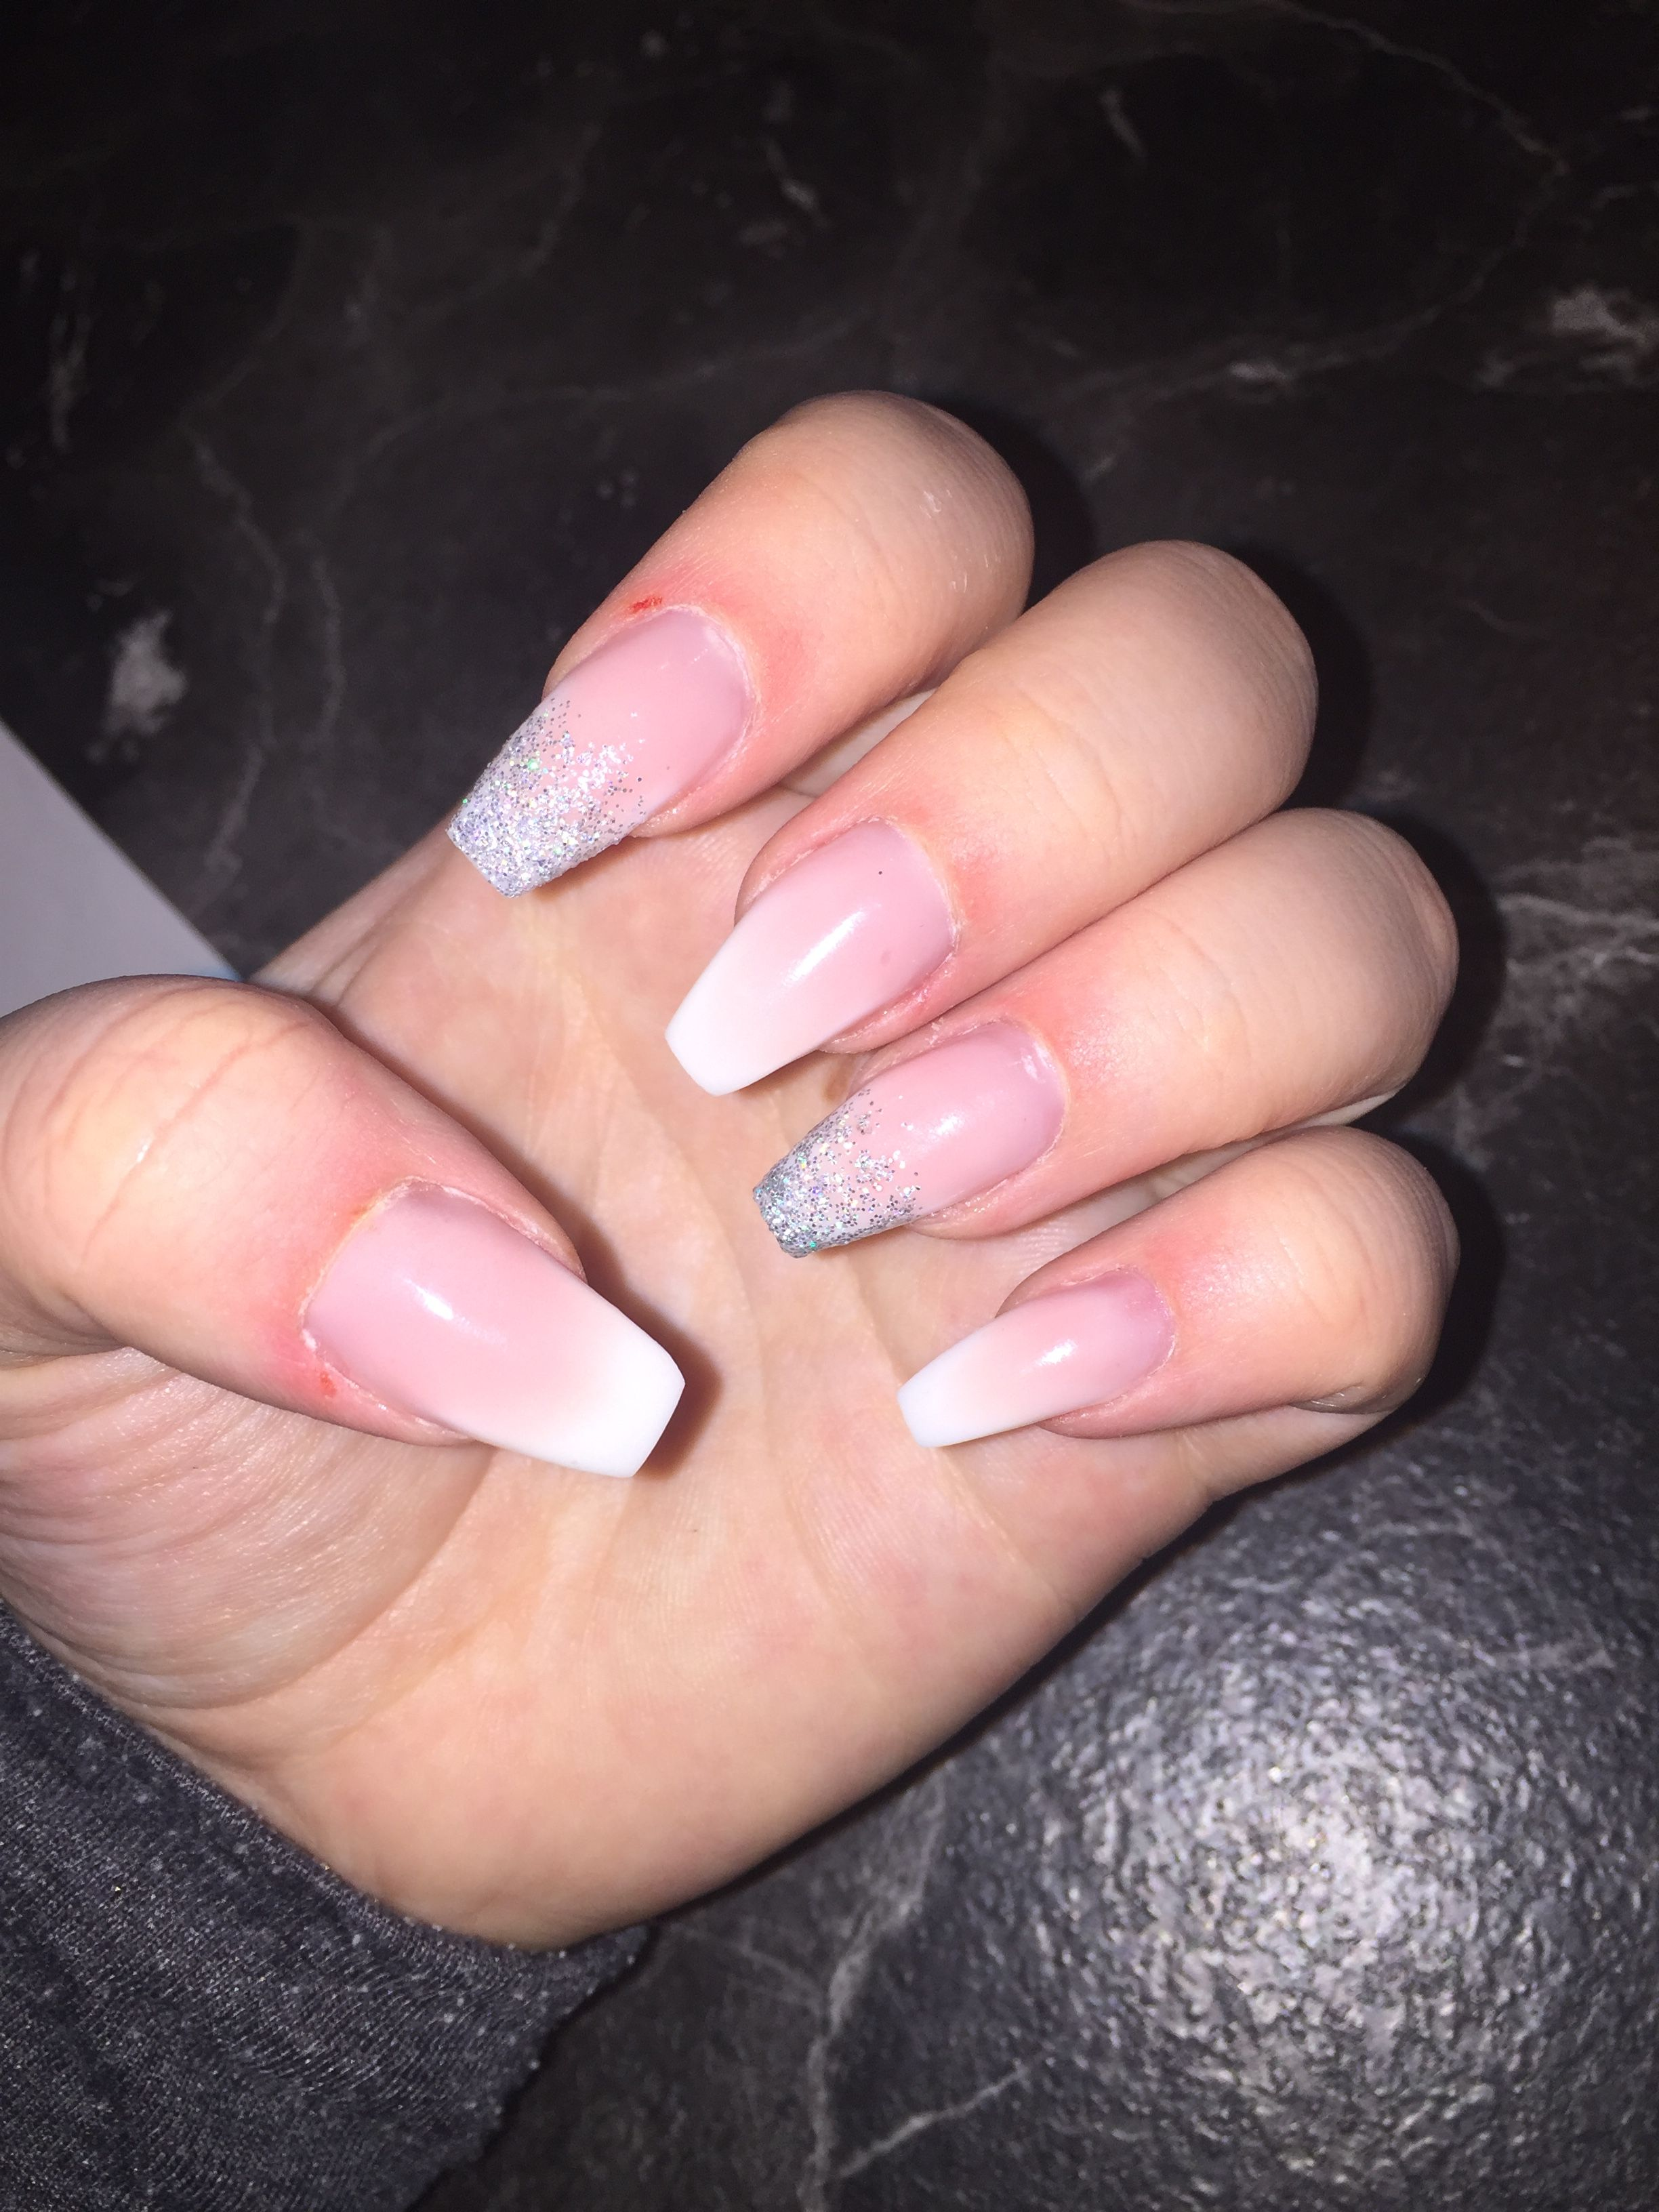 Nails Nagel Glitzer Silber Nature Gelnails Gelnagel